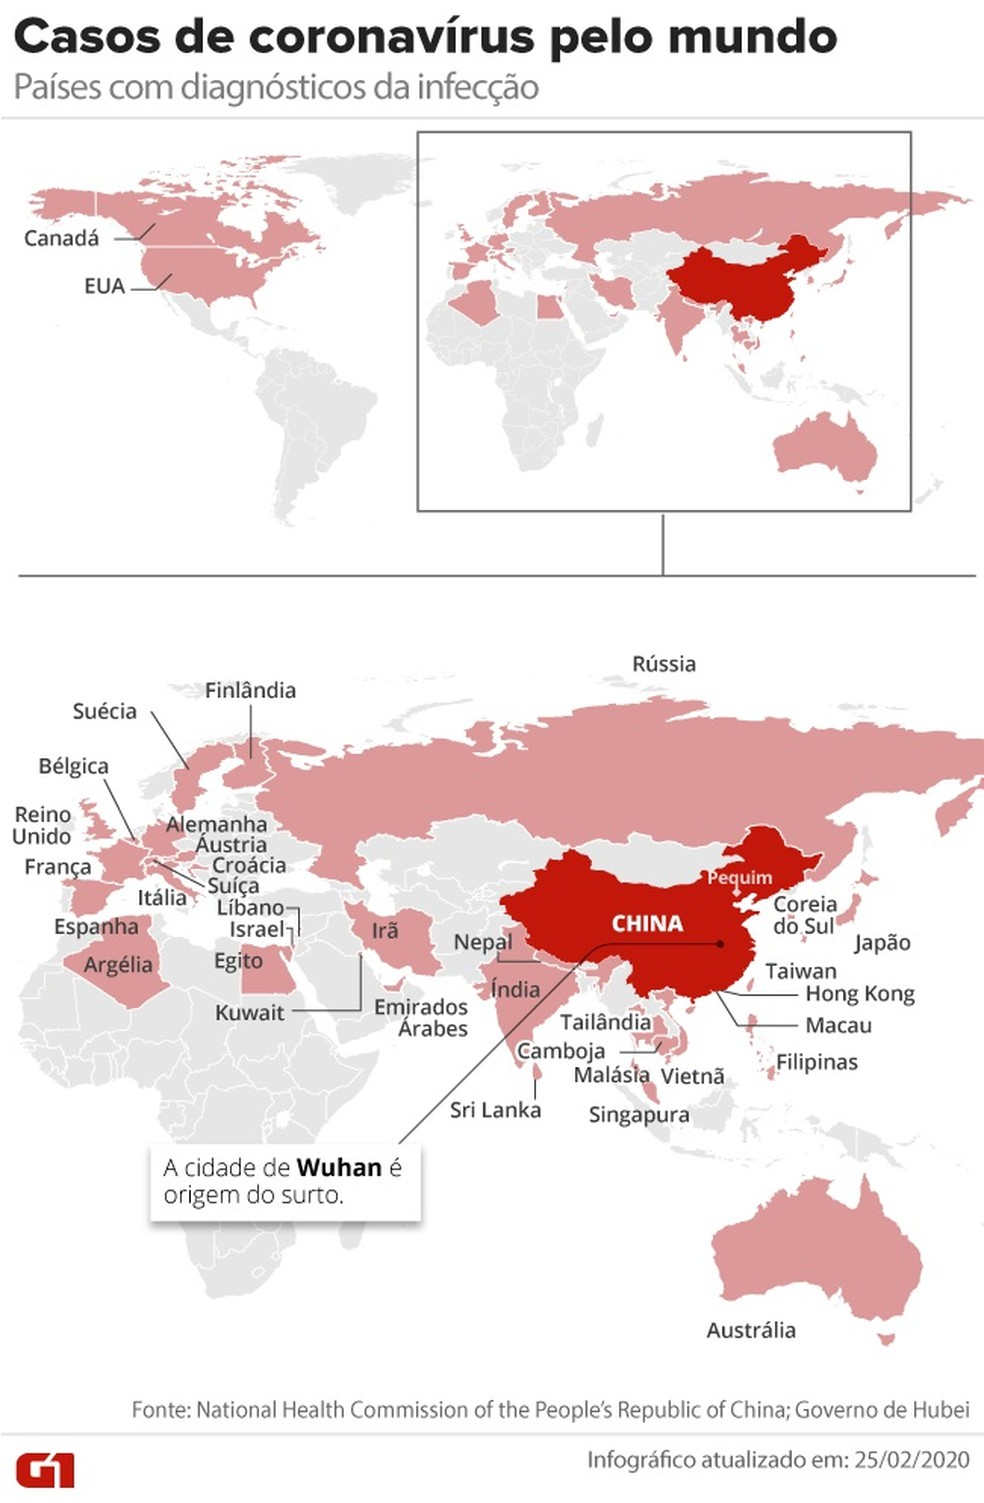 Casos de coronavírus pelo mundo.  — Foto: Arte/G1